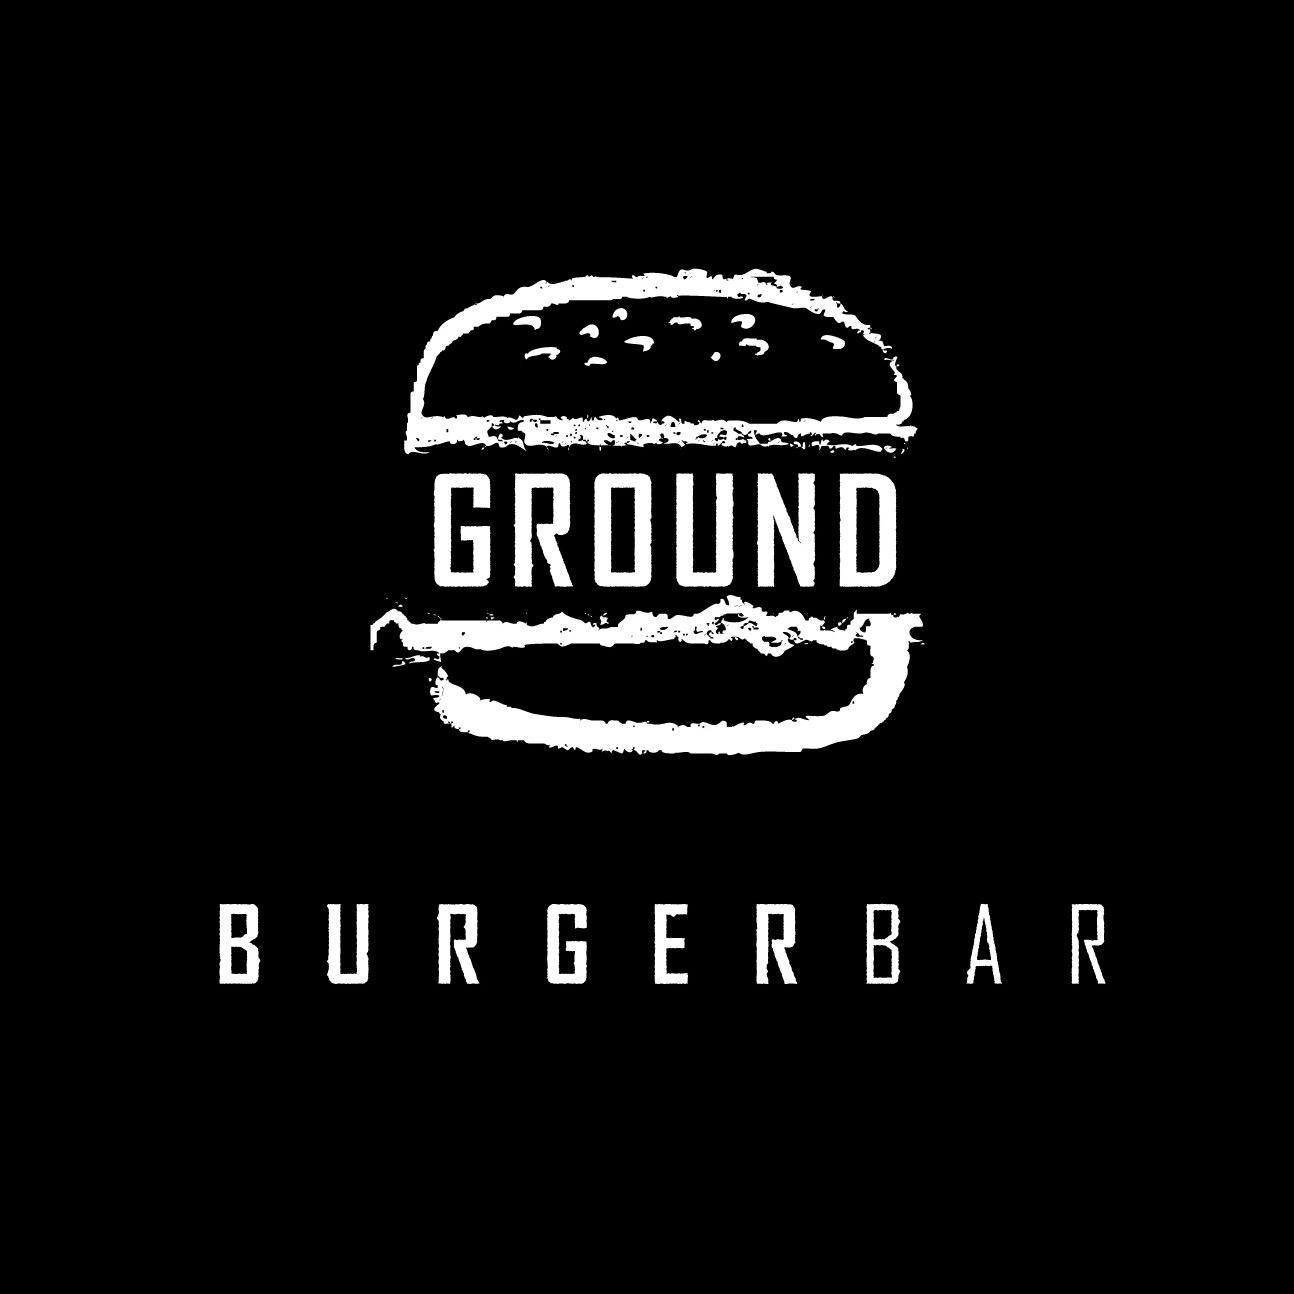 ground burger bar groundburgerbar twitter. Black Bedroom Furniture Sets. Home Design Ideas